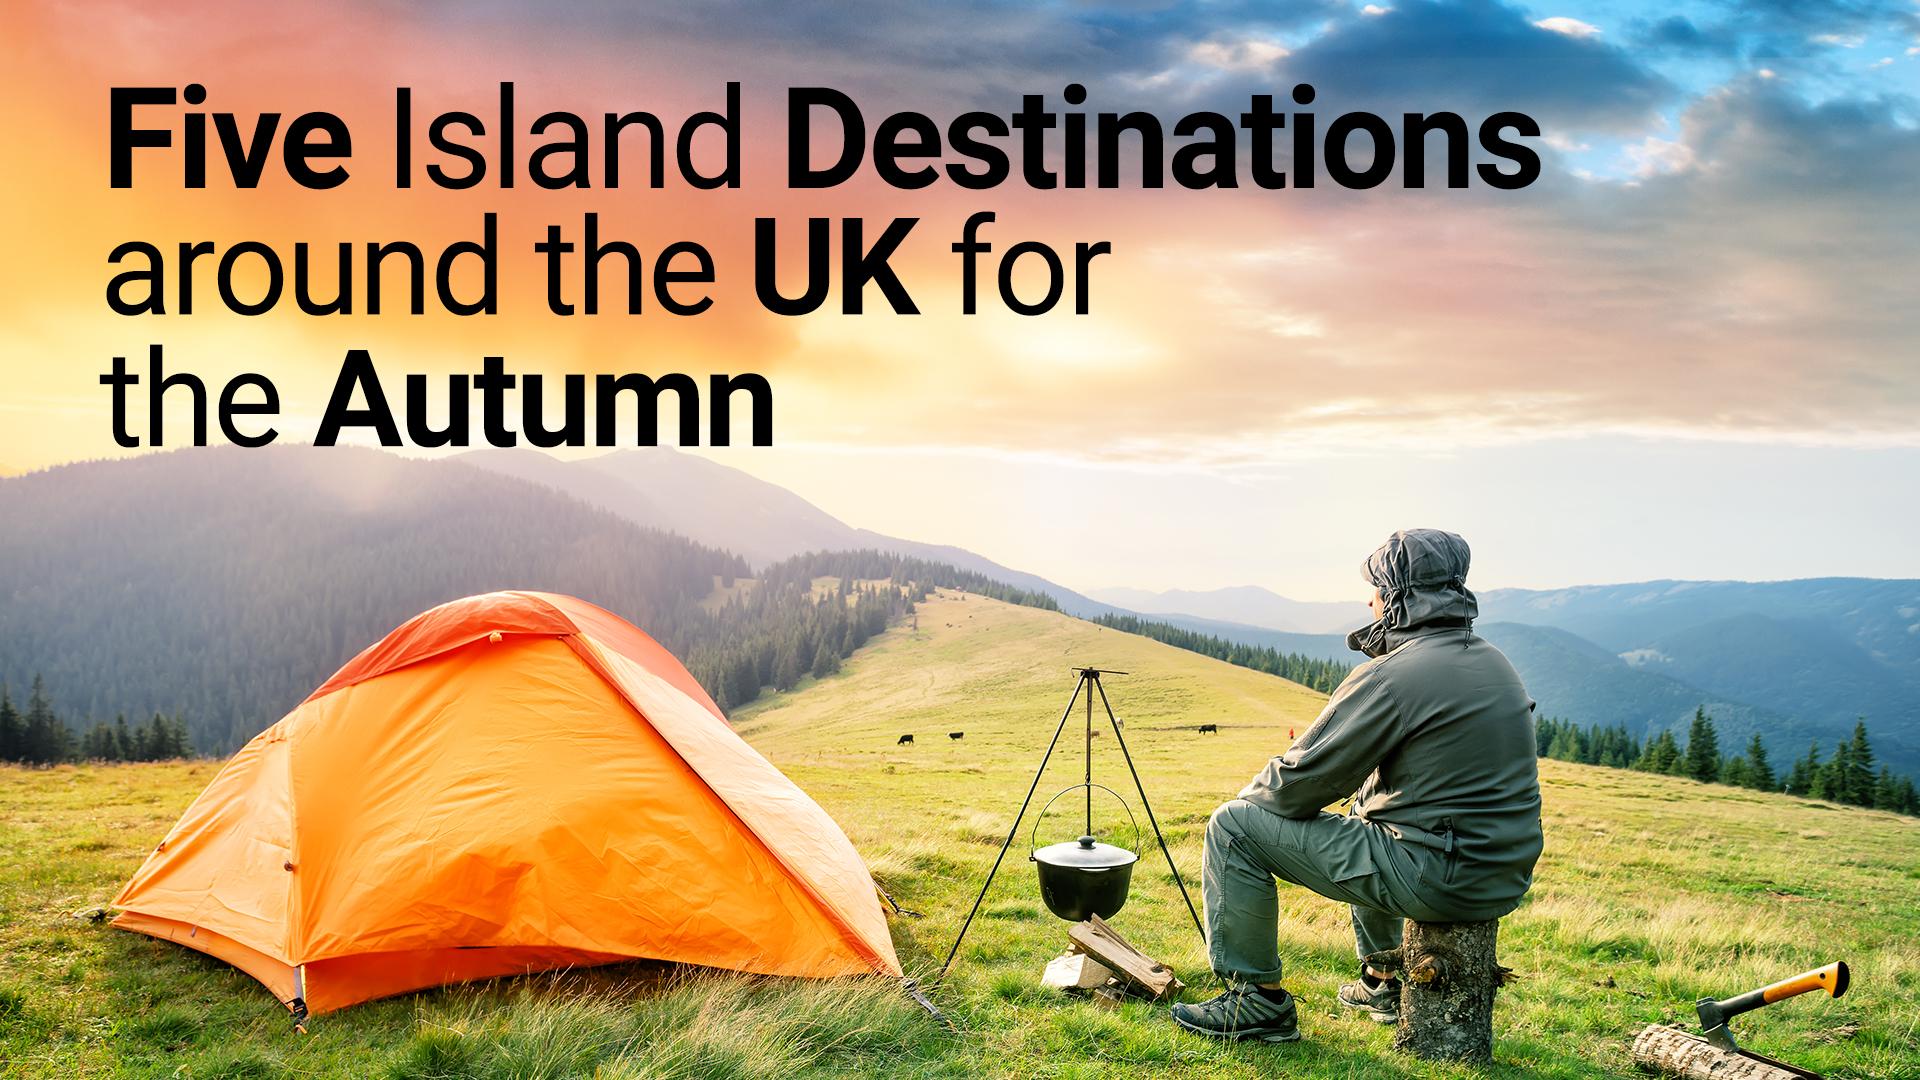 Five Island destinations around the UK in Autumn